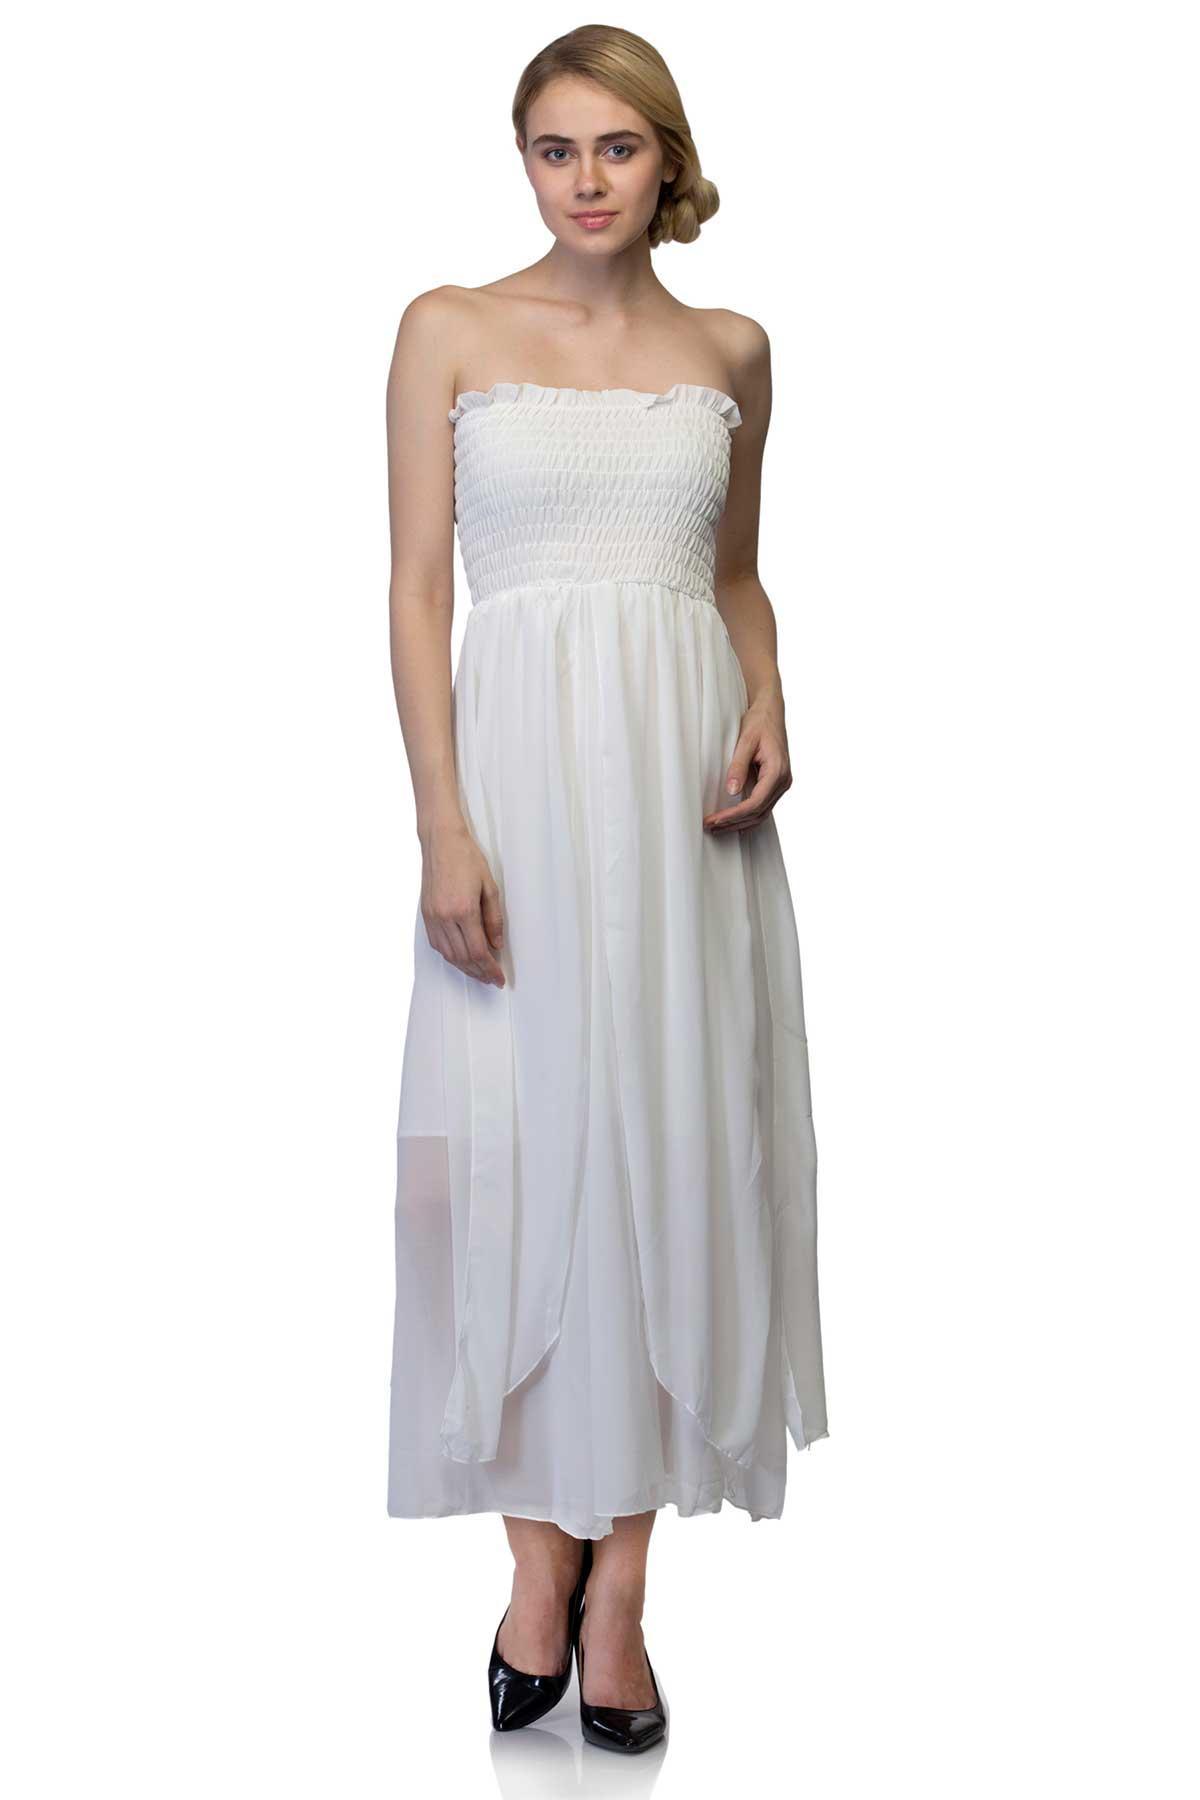 e388dc953c1 White Tube Dress by RIB for rent online